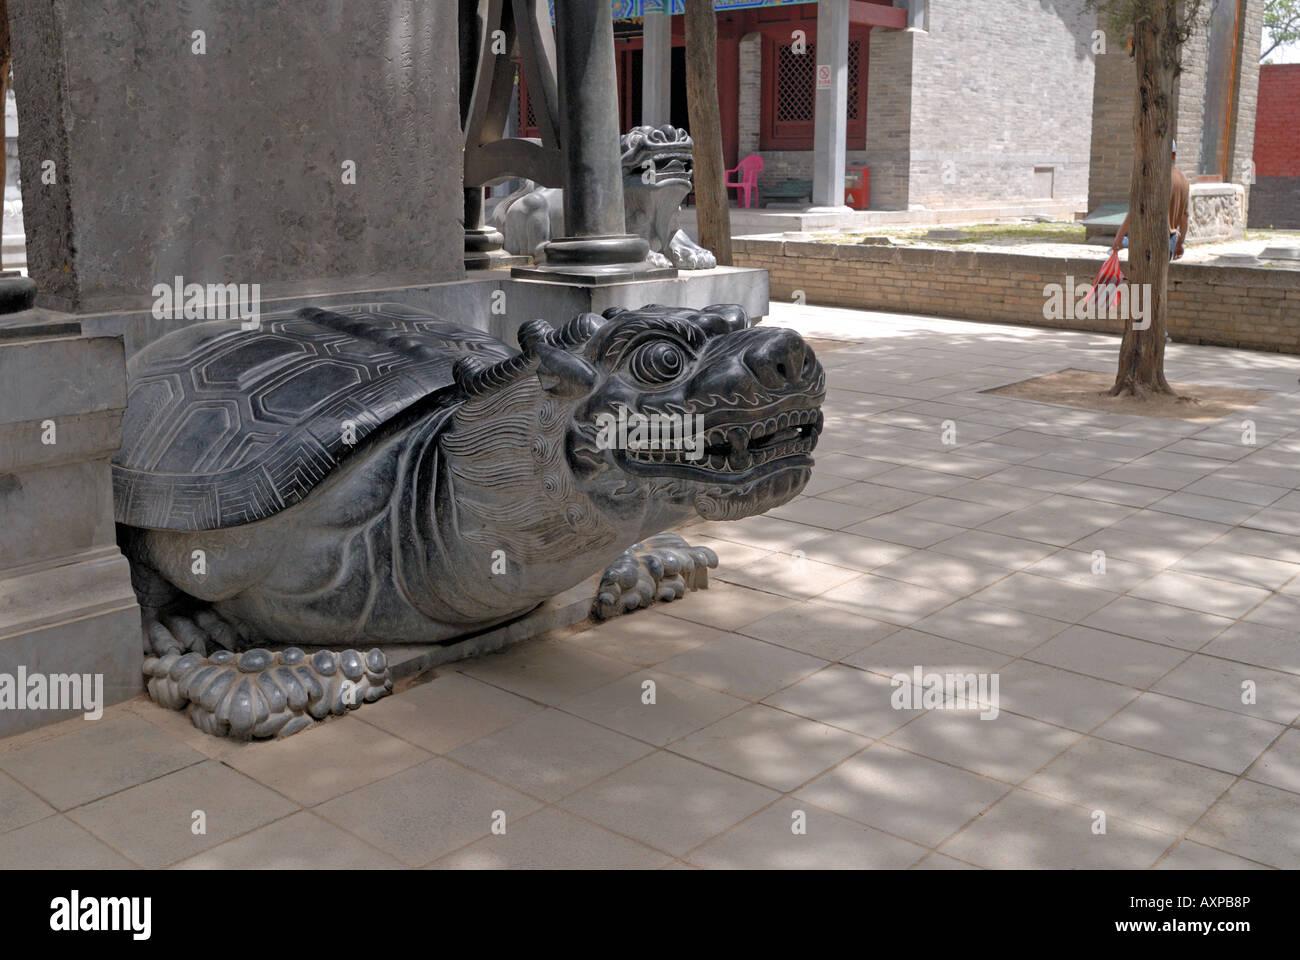 Stylised turtle at base of stele at Shaolin Buddhist Monastery Temple Henan Province Dengfeng Shaolin China Asia Stock Photo